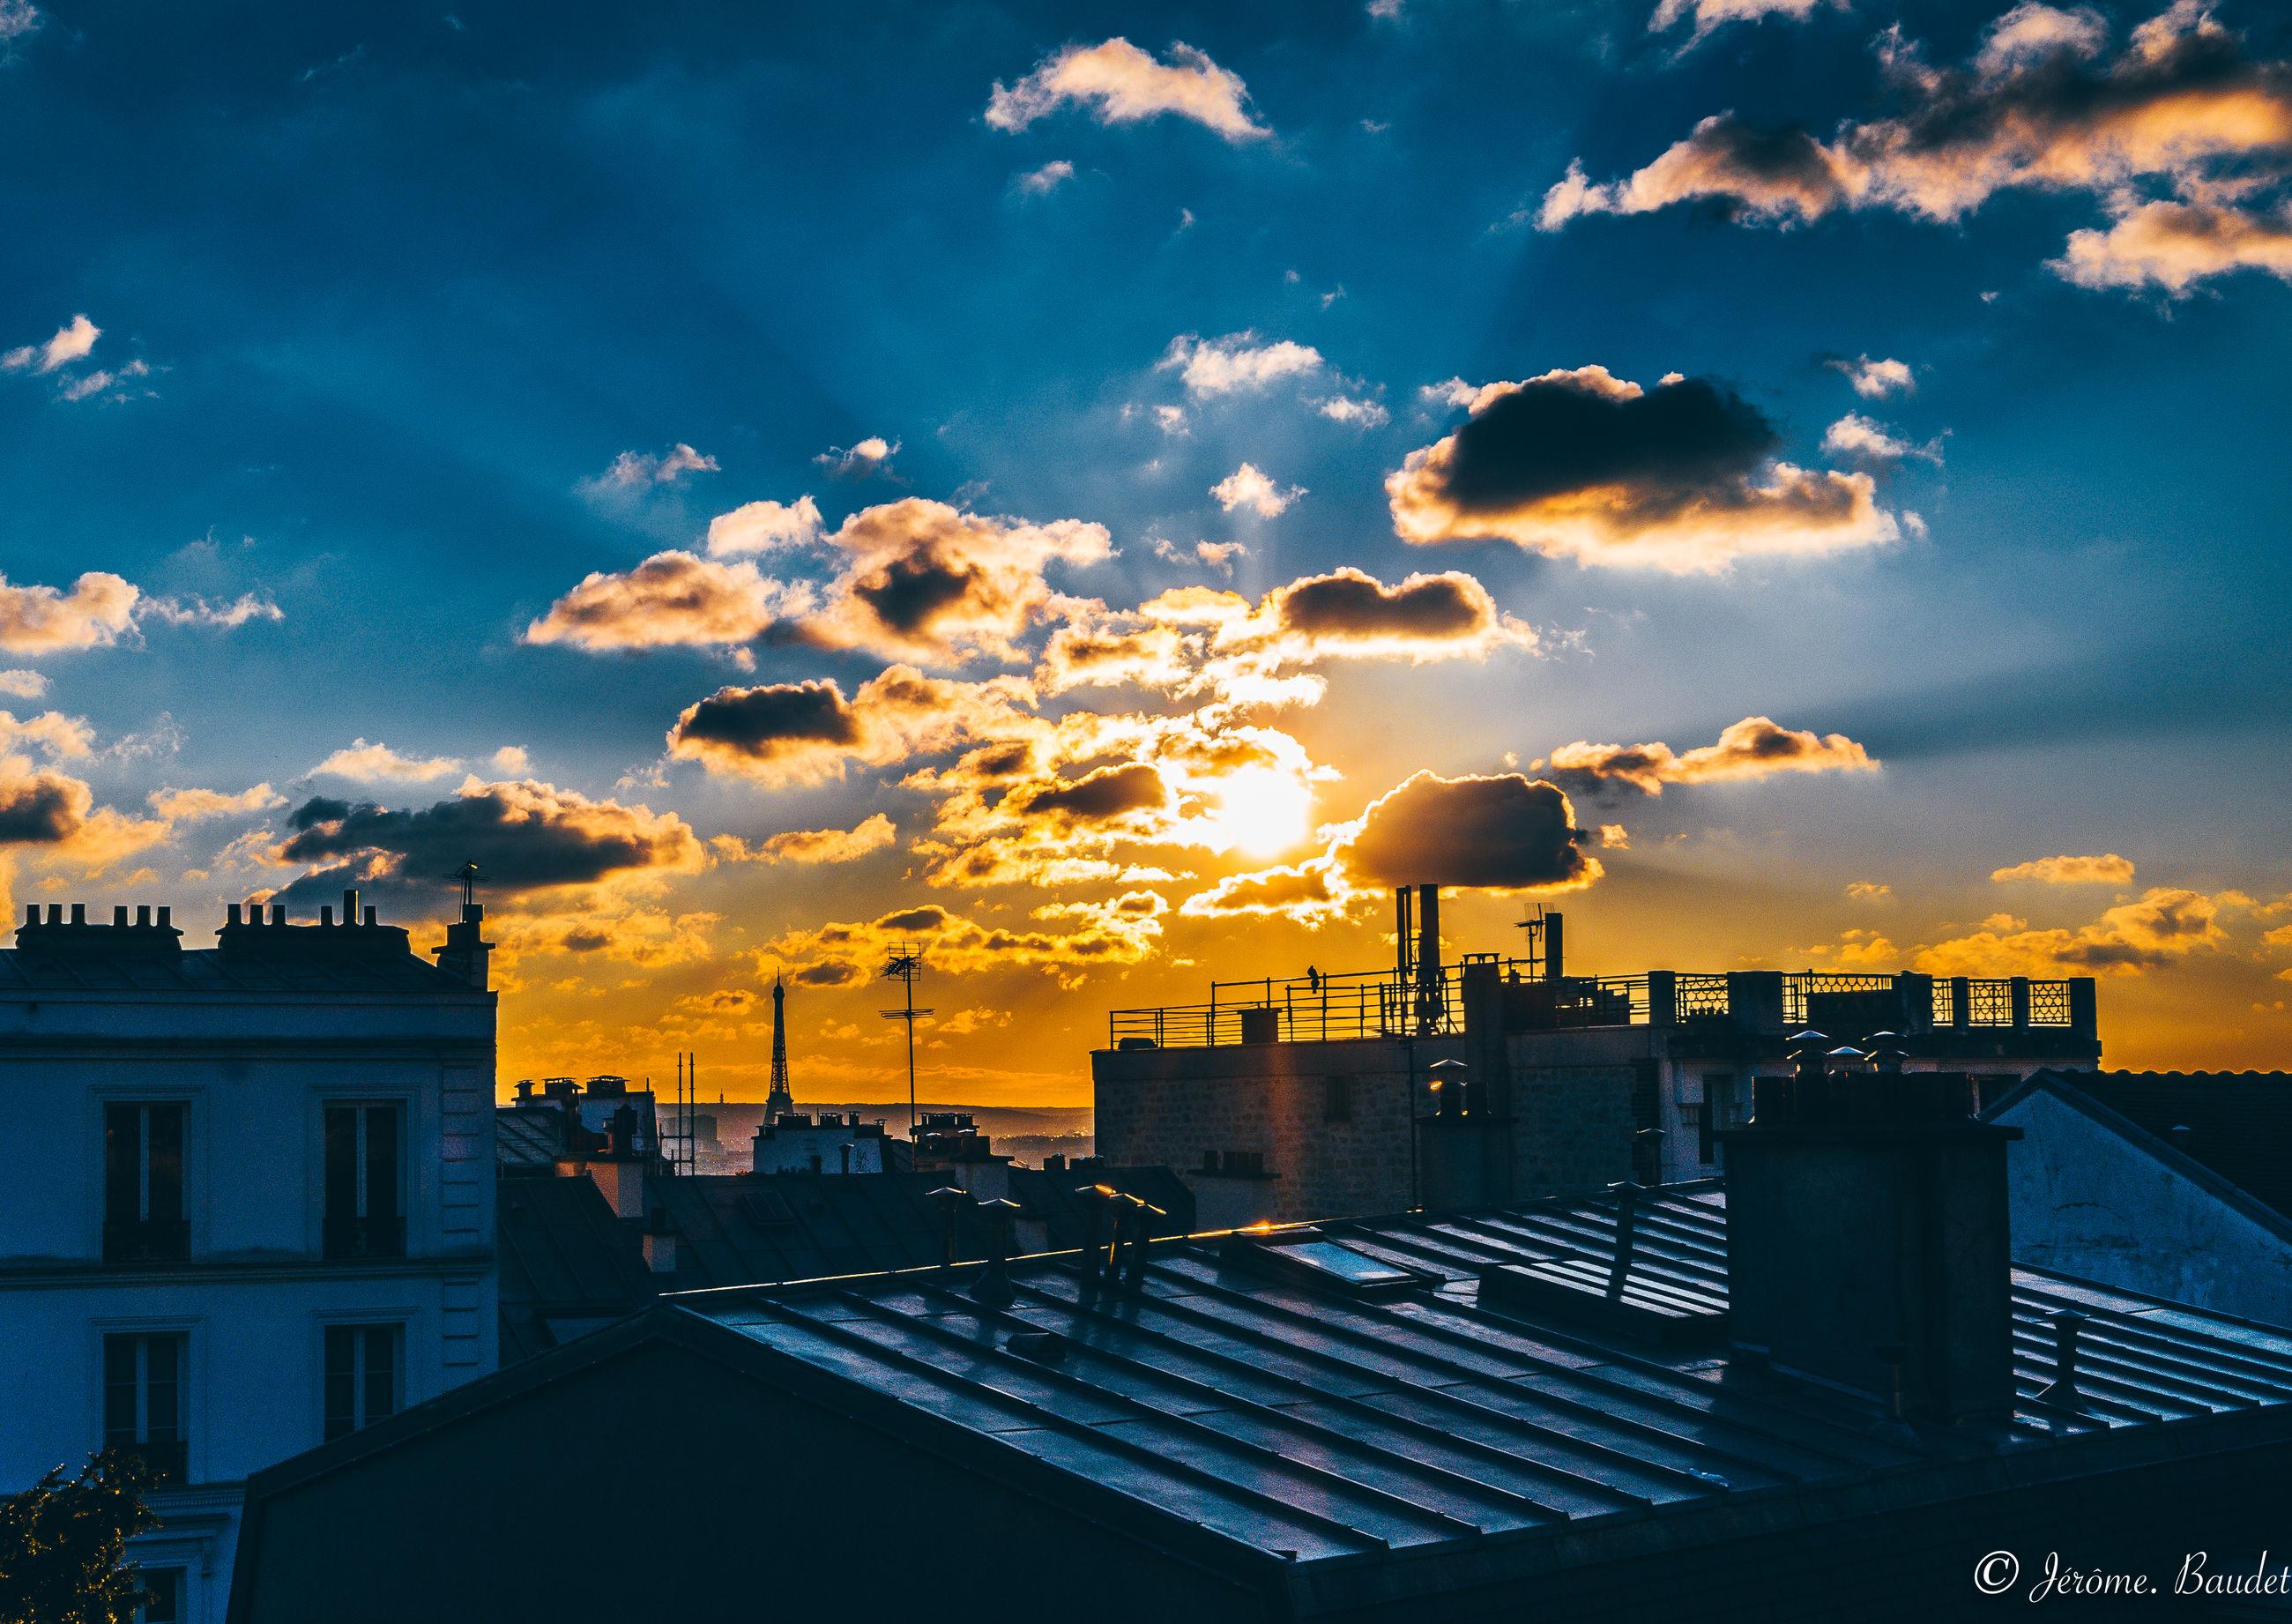 cloud - sky, sky, architecture, building exterior, built structure, sunset, city, building, nature, sunlight, orange color, no people, cityscape, residential district, outdoors, silhouette, sun, sunbeam, urban skyline, beauty in nature, office building exterior, skyscraper